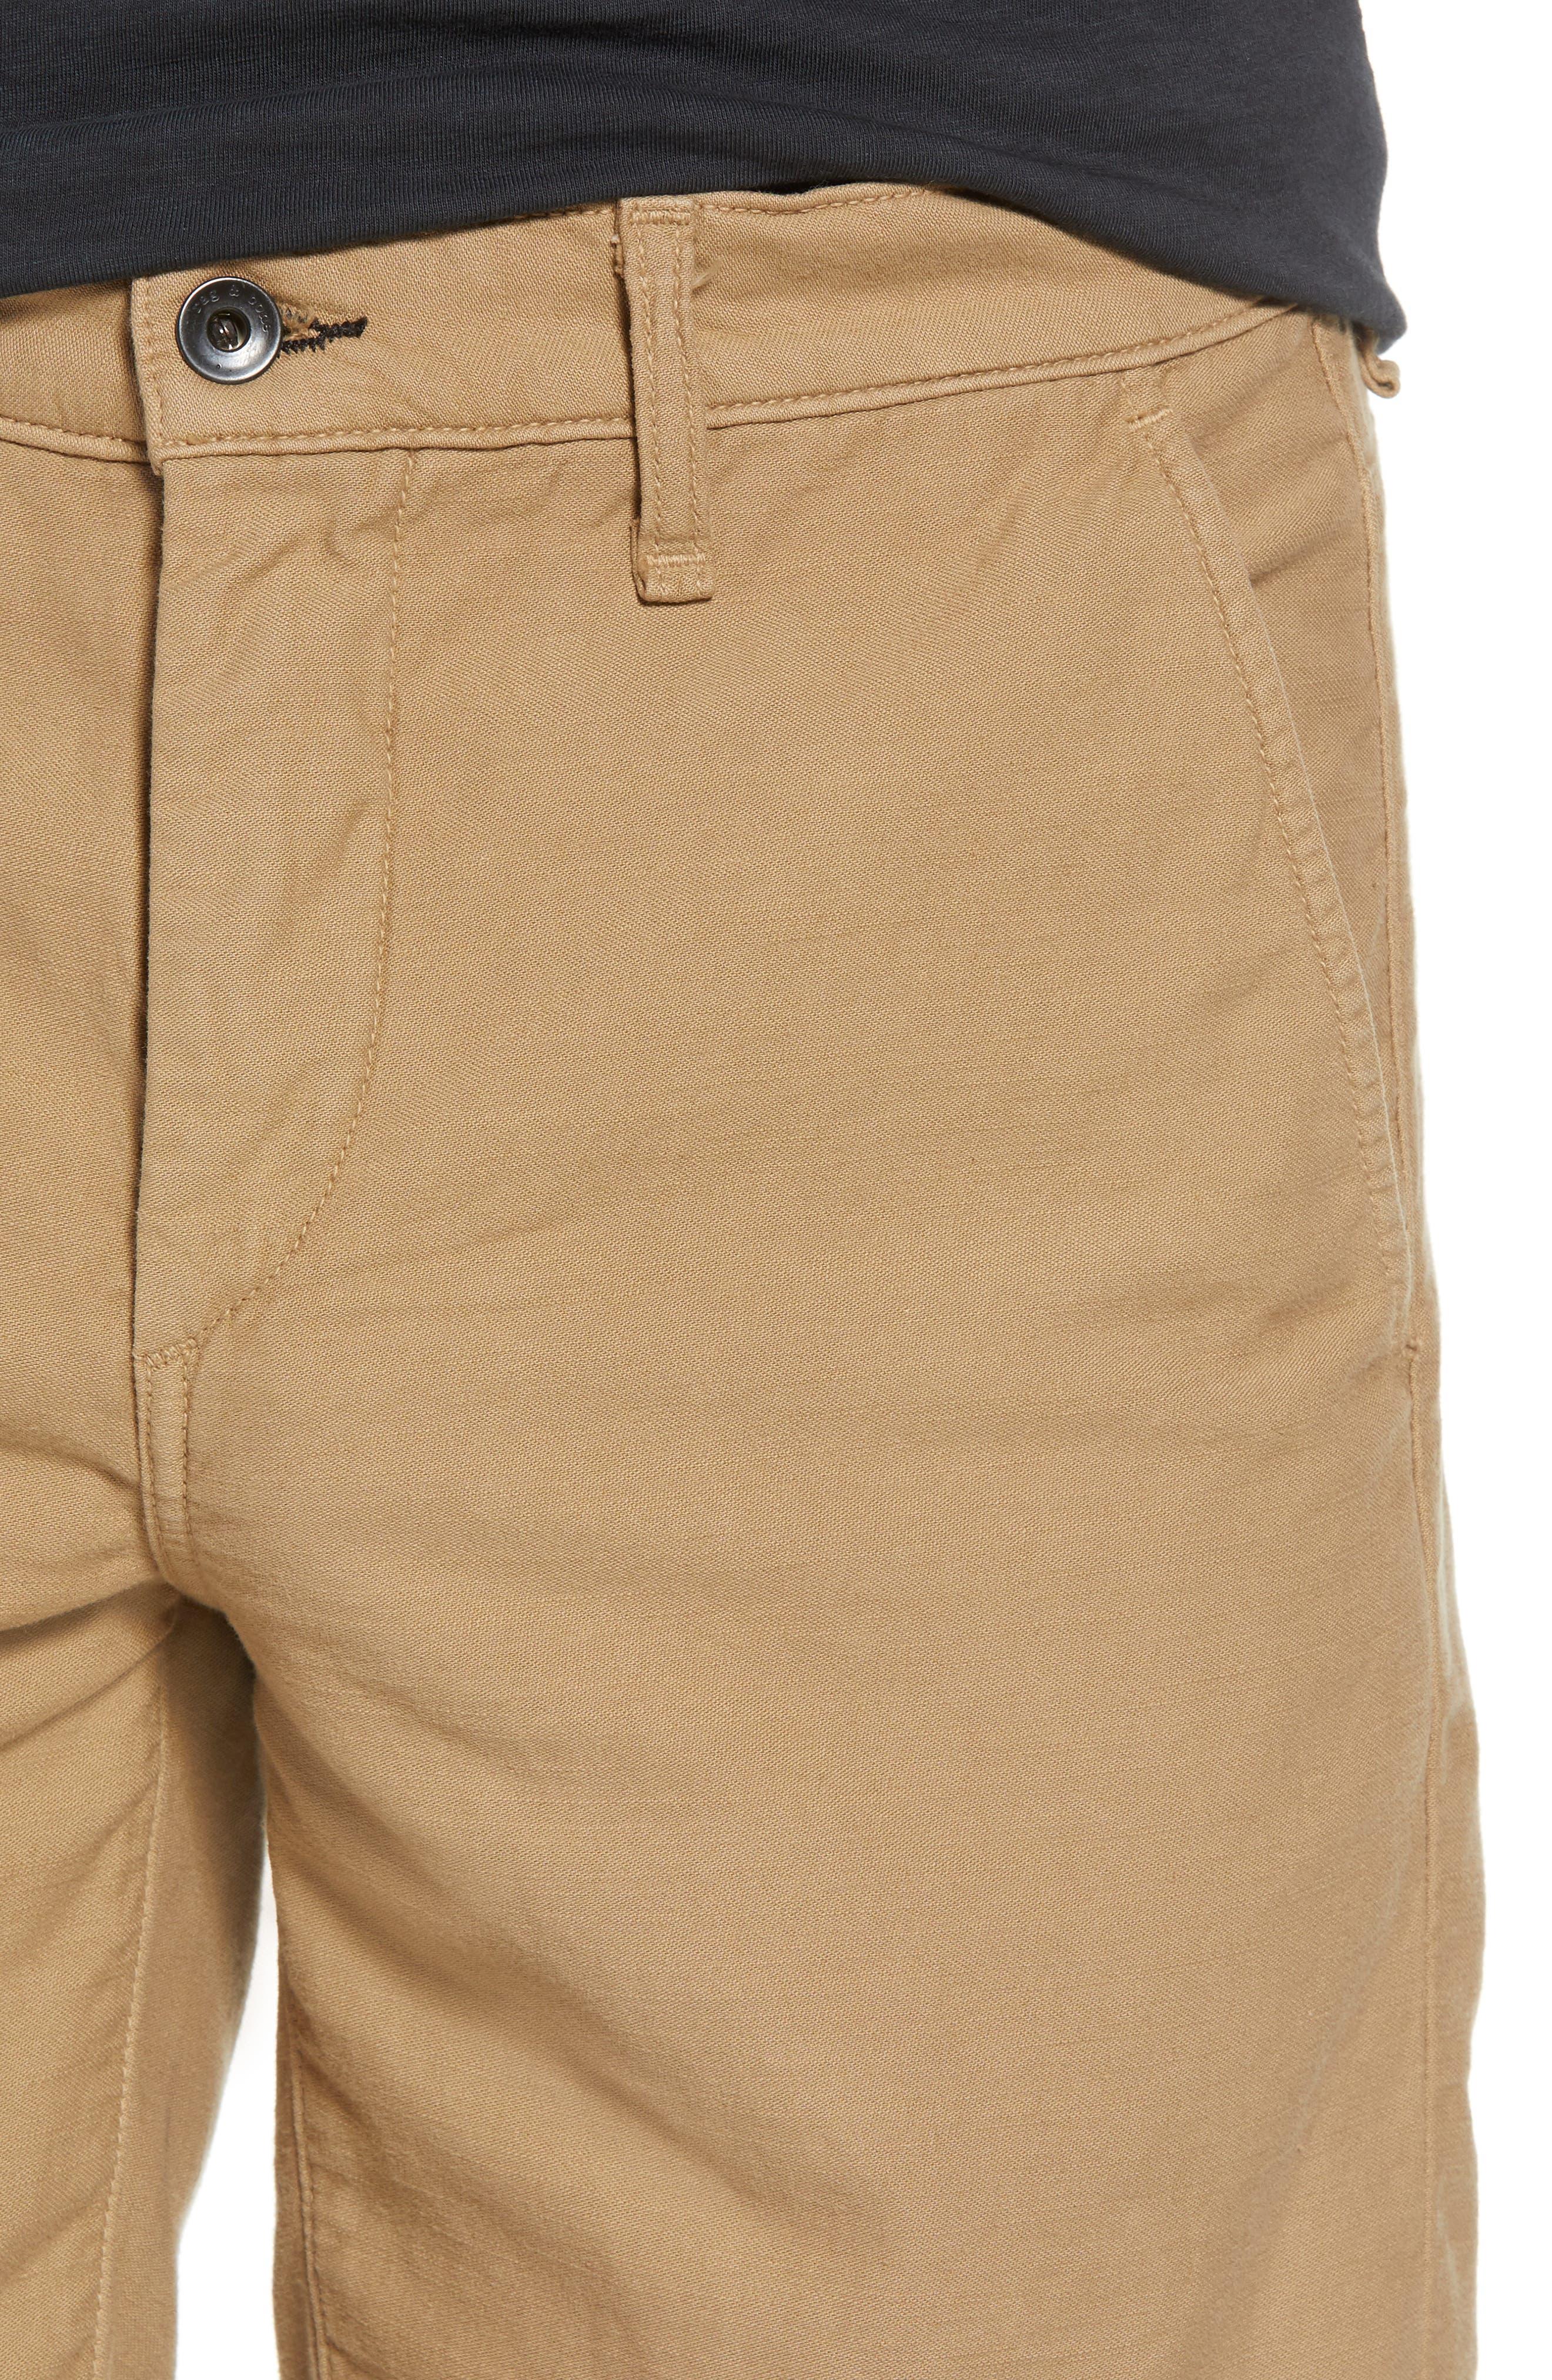 Straight Leg Chino Shorts,                             Alternate thumbnail 4, color,                             KHAKI